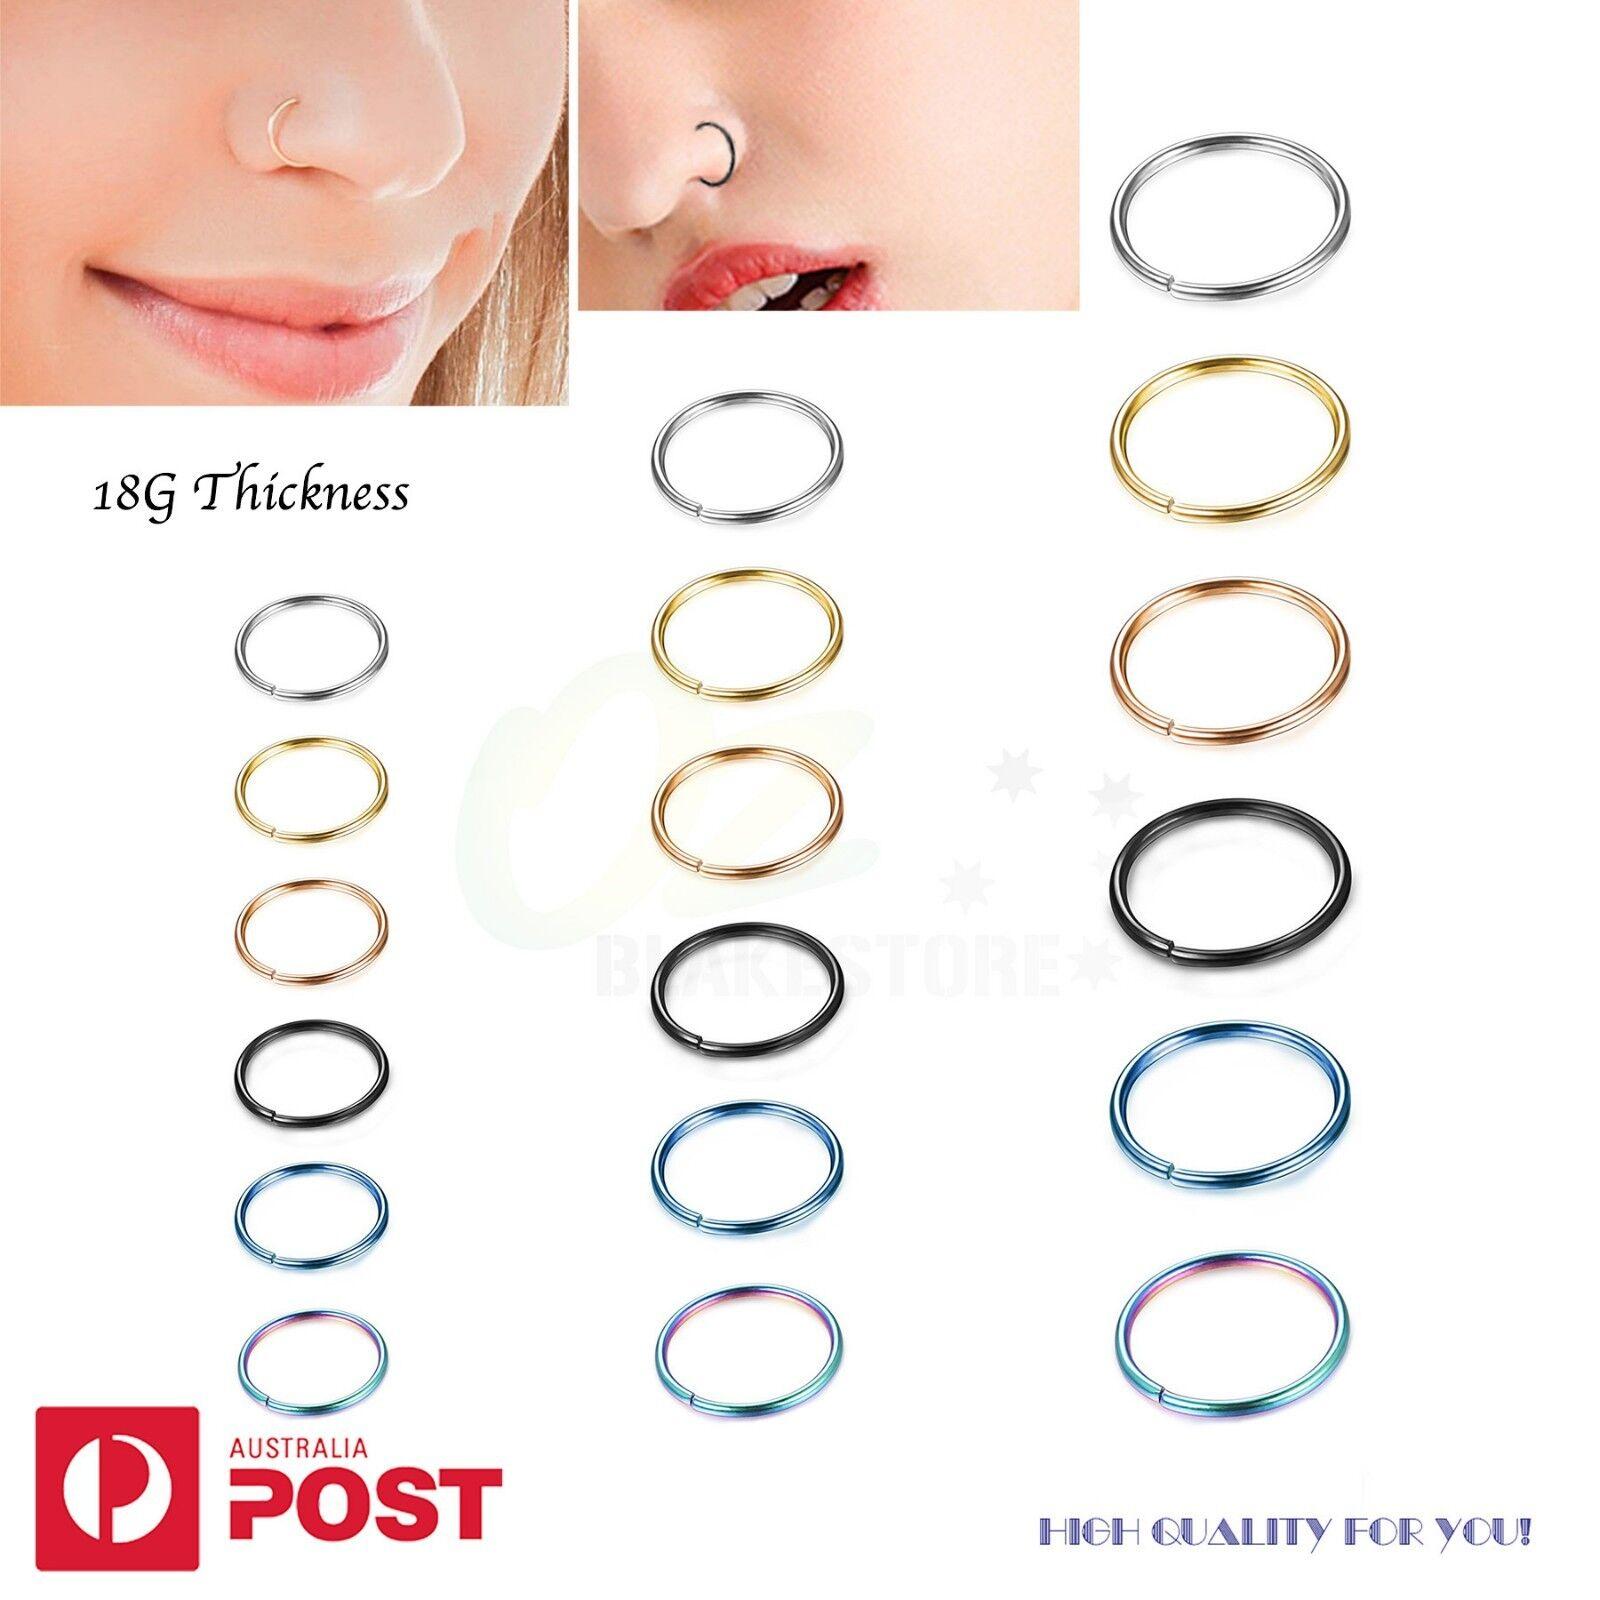 Jewellery - 2-8PCS 18G Nose Cartilage Ring Tragus Septum Surgical Steel Piercing Hoop 6-10mm